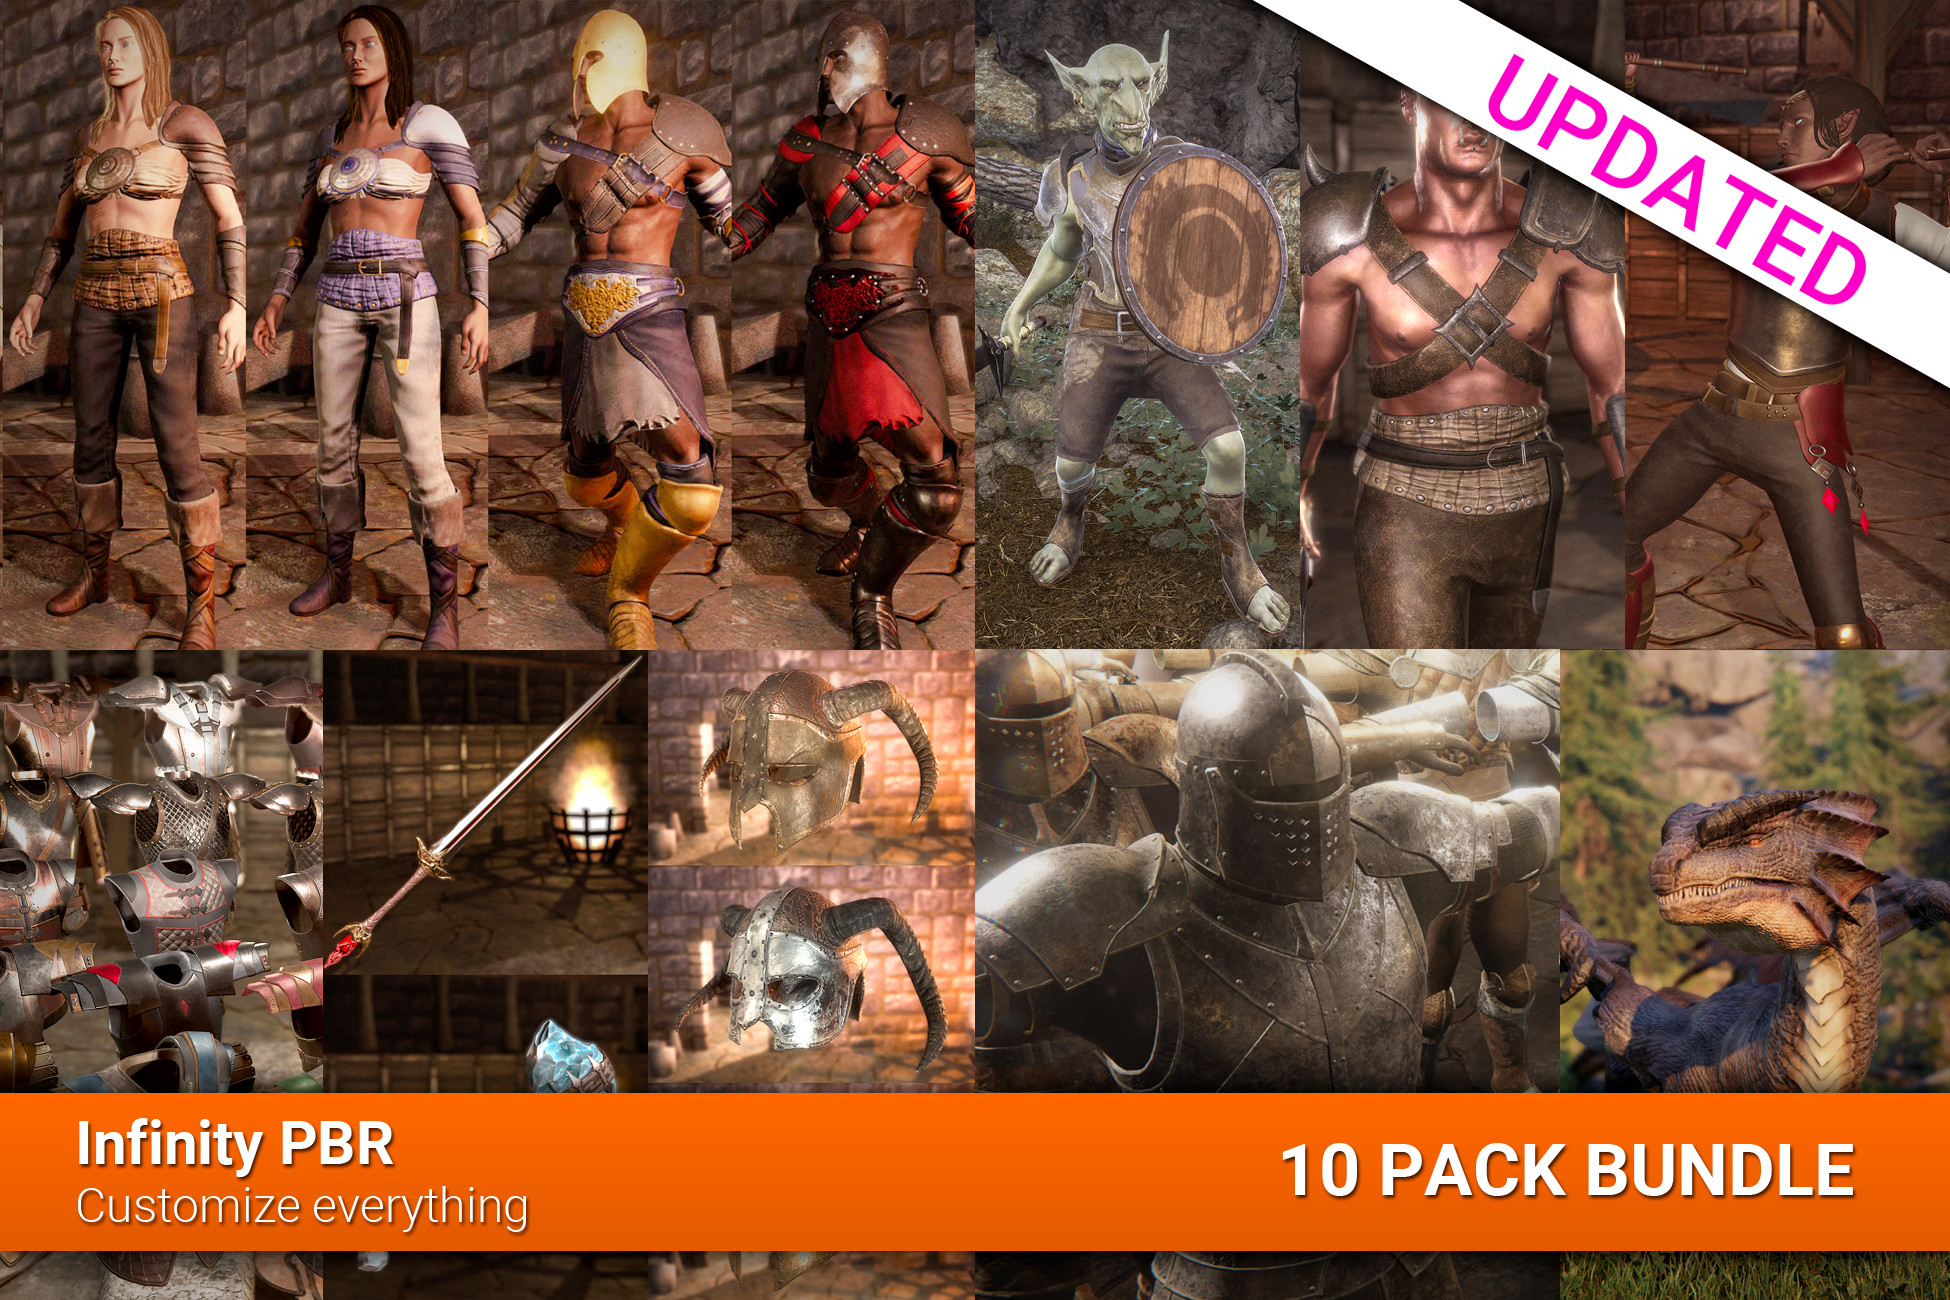 RPG Character Complete Bundle - 10 Pack Bundle!